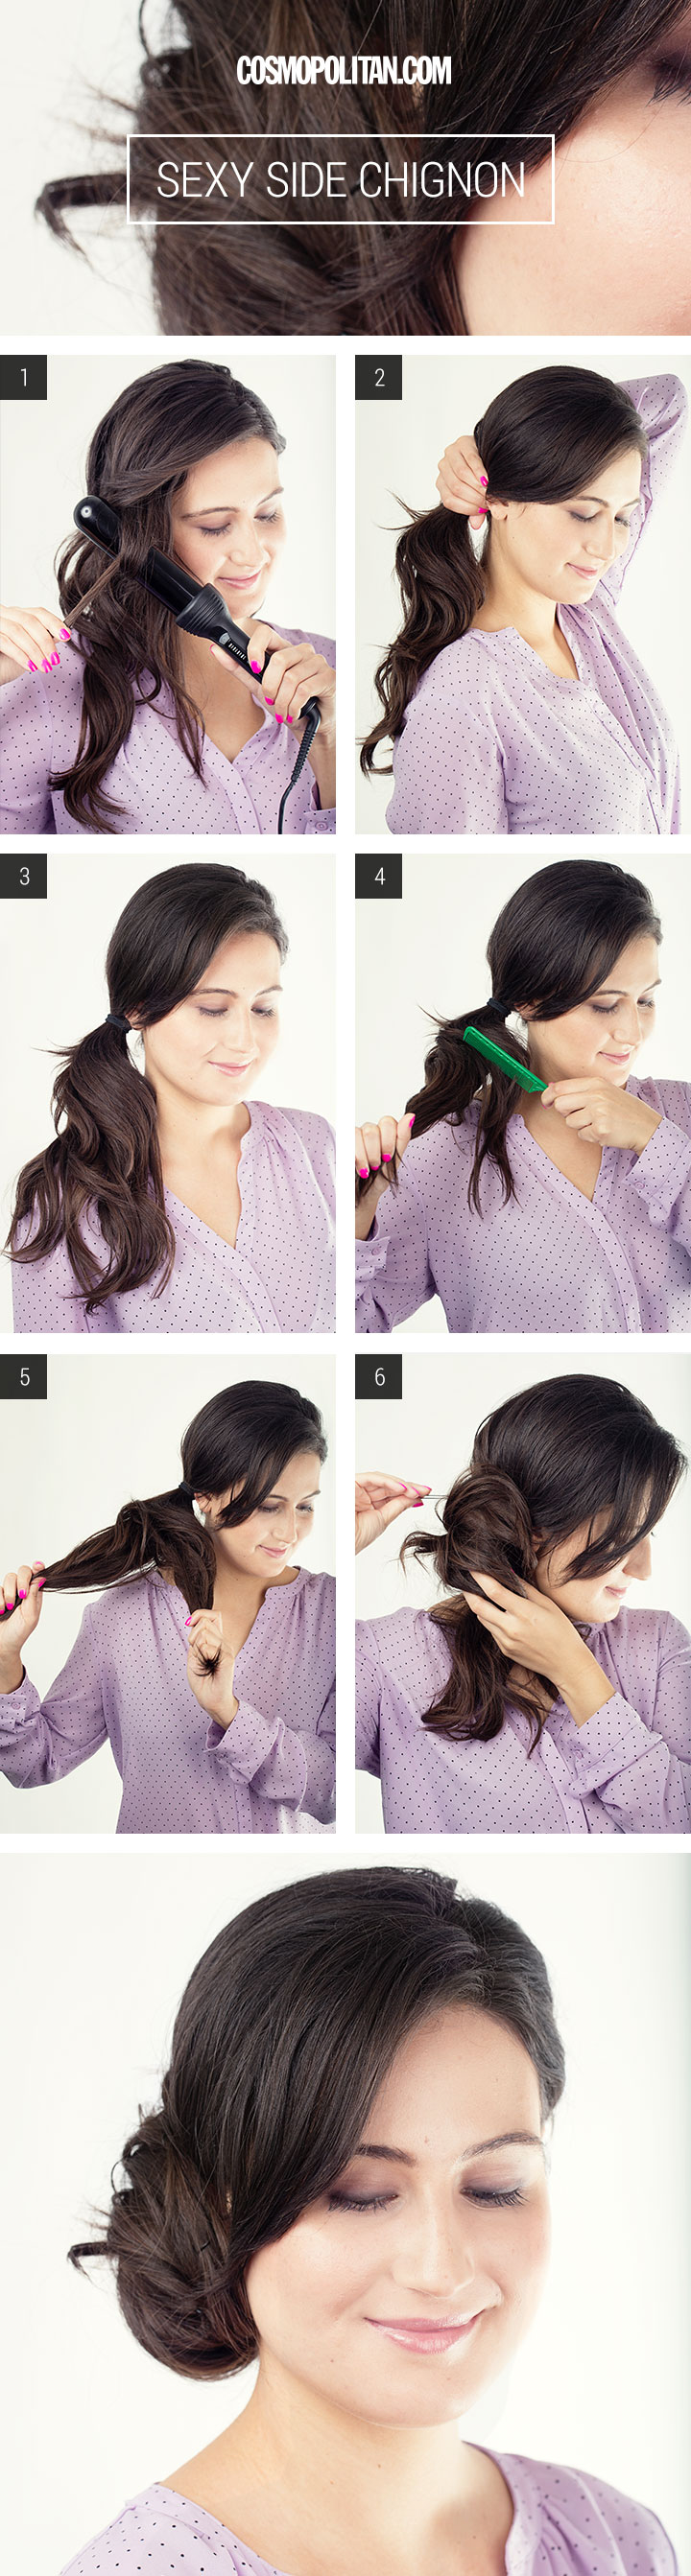 Amazing Hair Tutorials 15 Simple Easy Hairstyles You Should Not Miss Short Hairstyles Gunalazisus